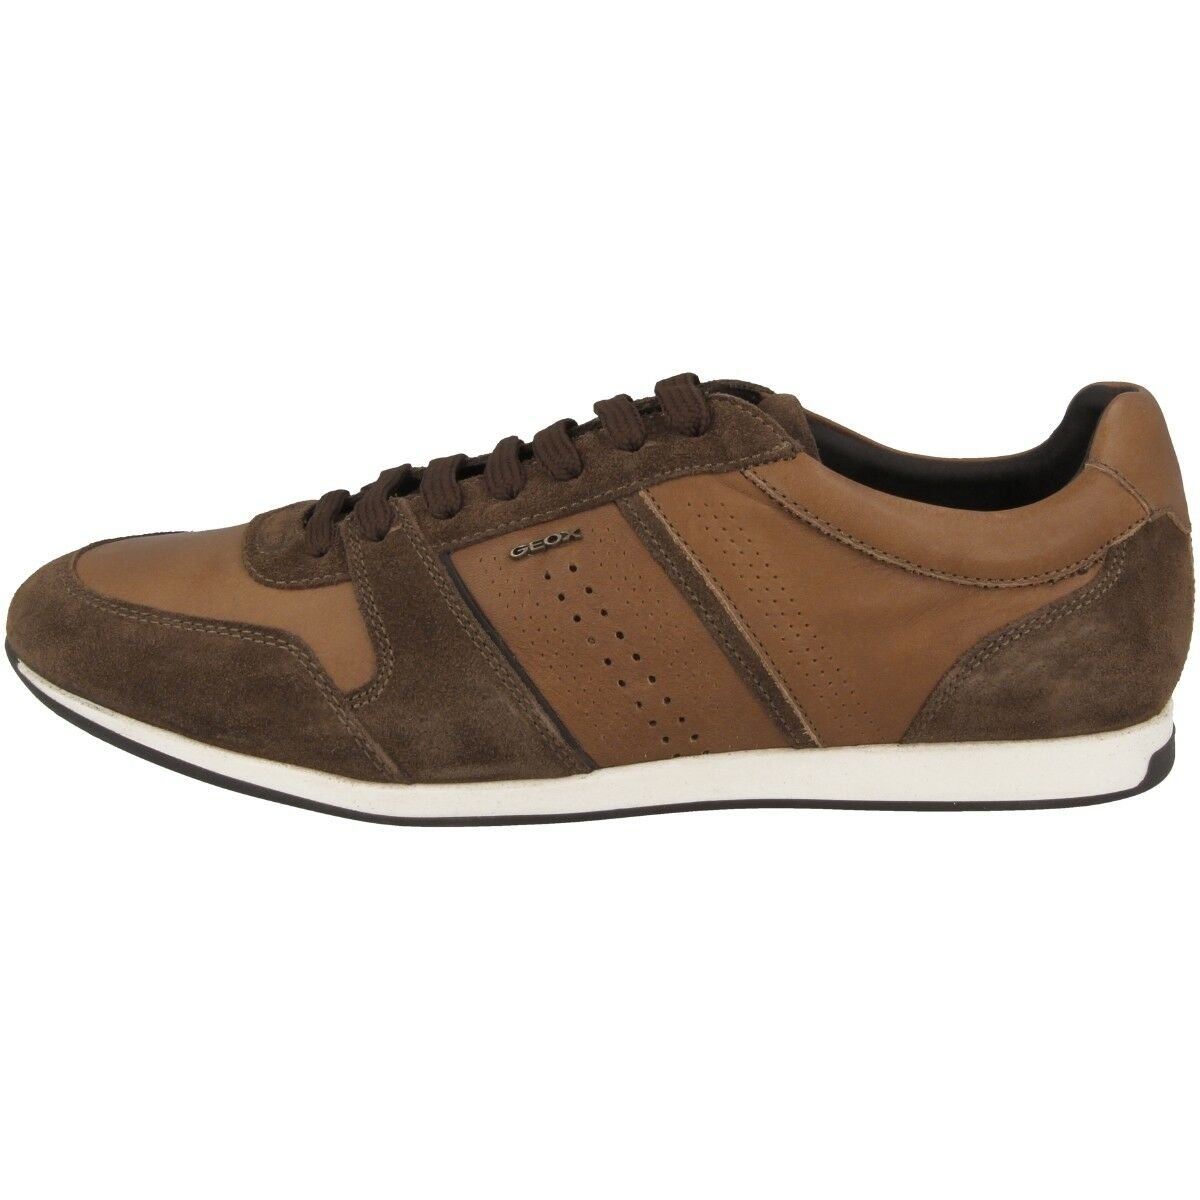 GEOX U Clemet A Schuhe Herren Sneaker Leder Halbschuhe cognac U822FA0FF22C6N6G